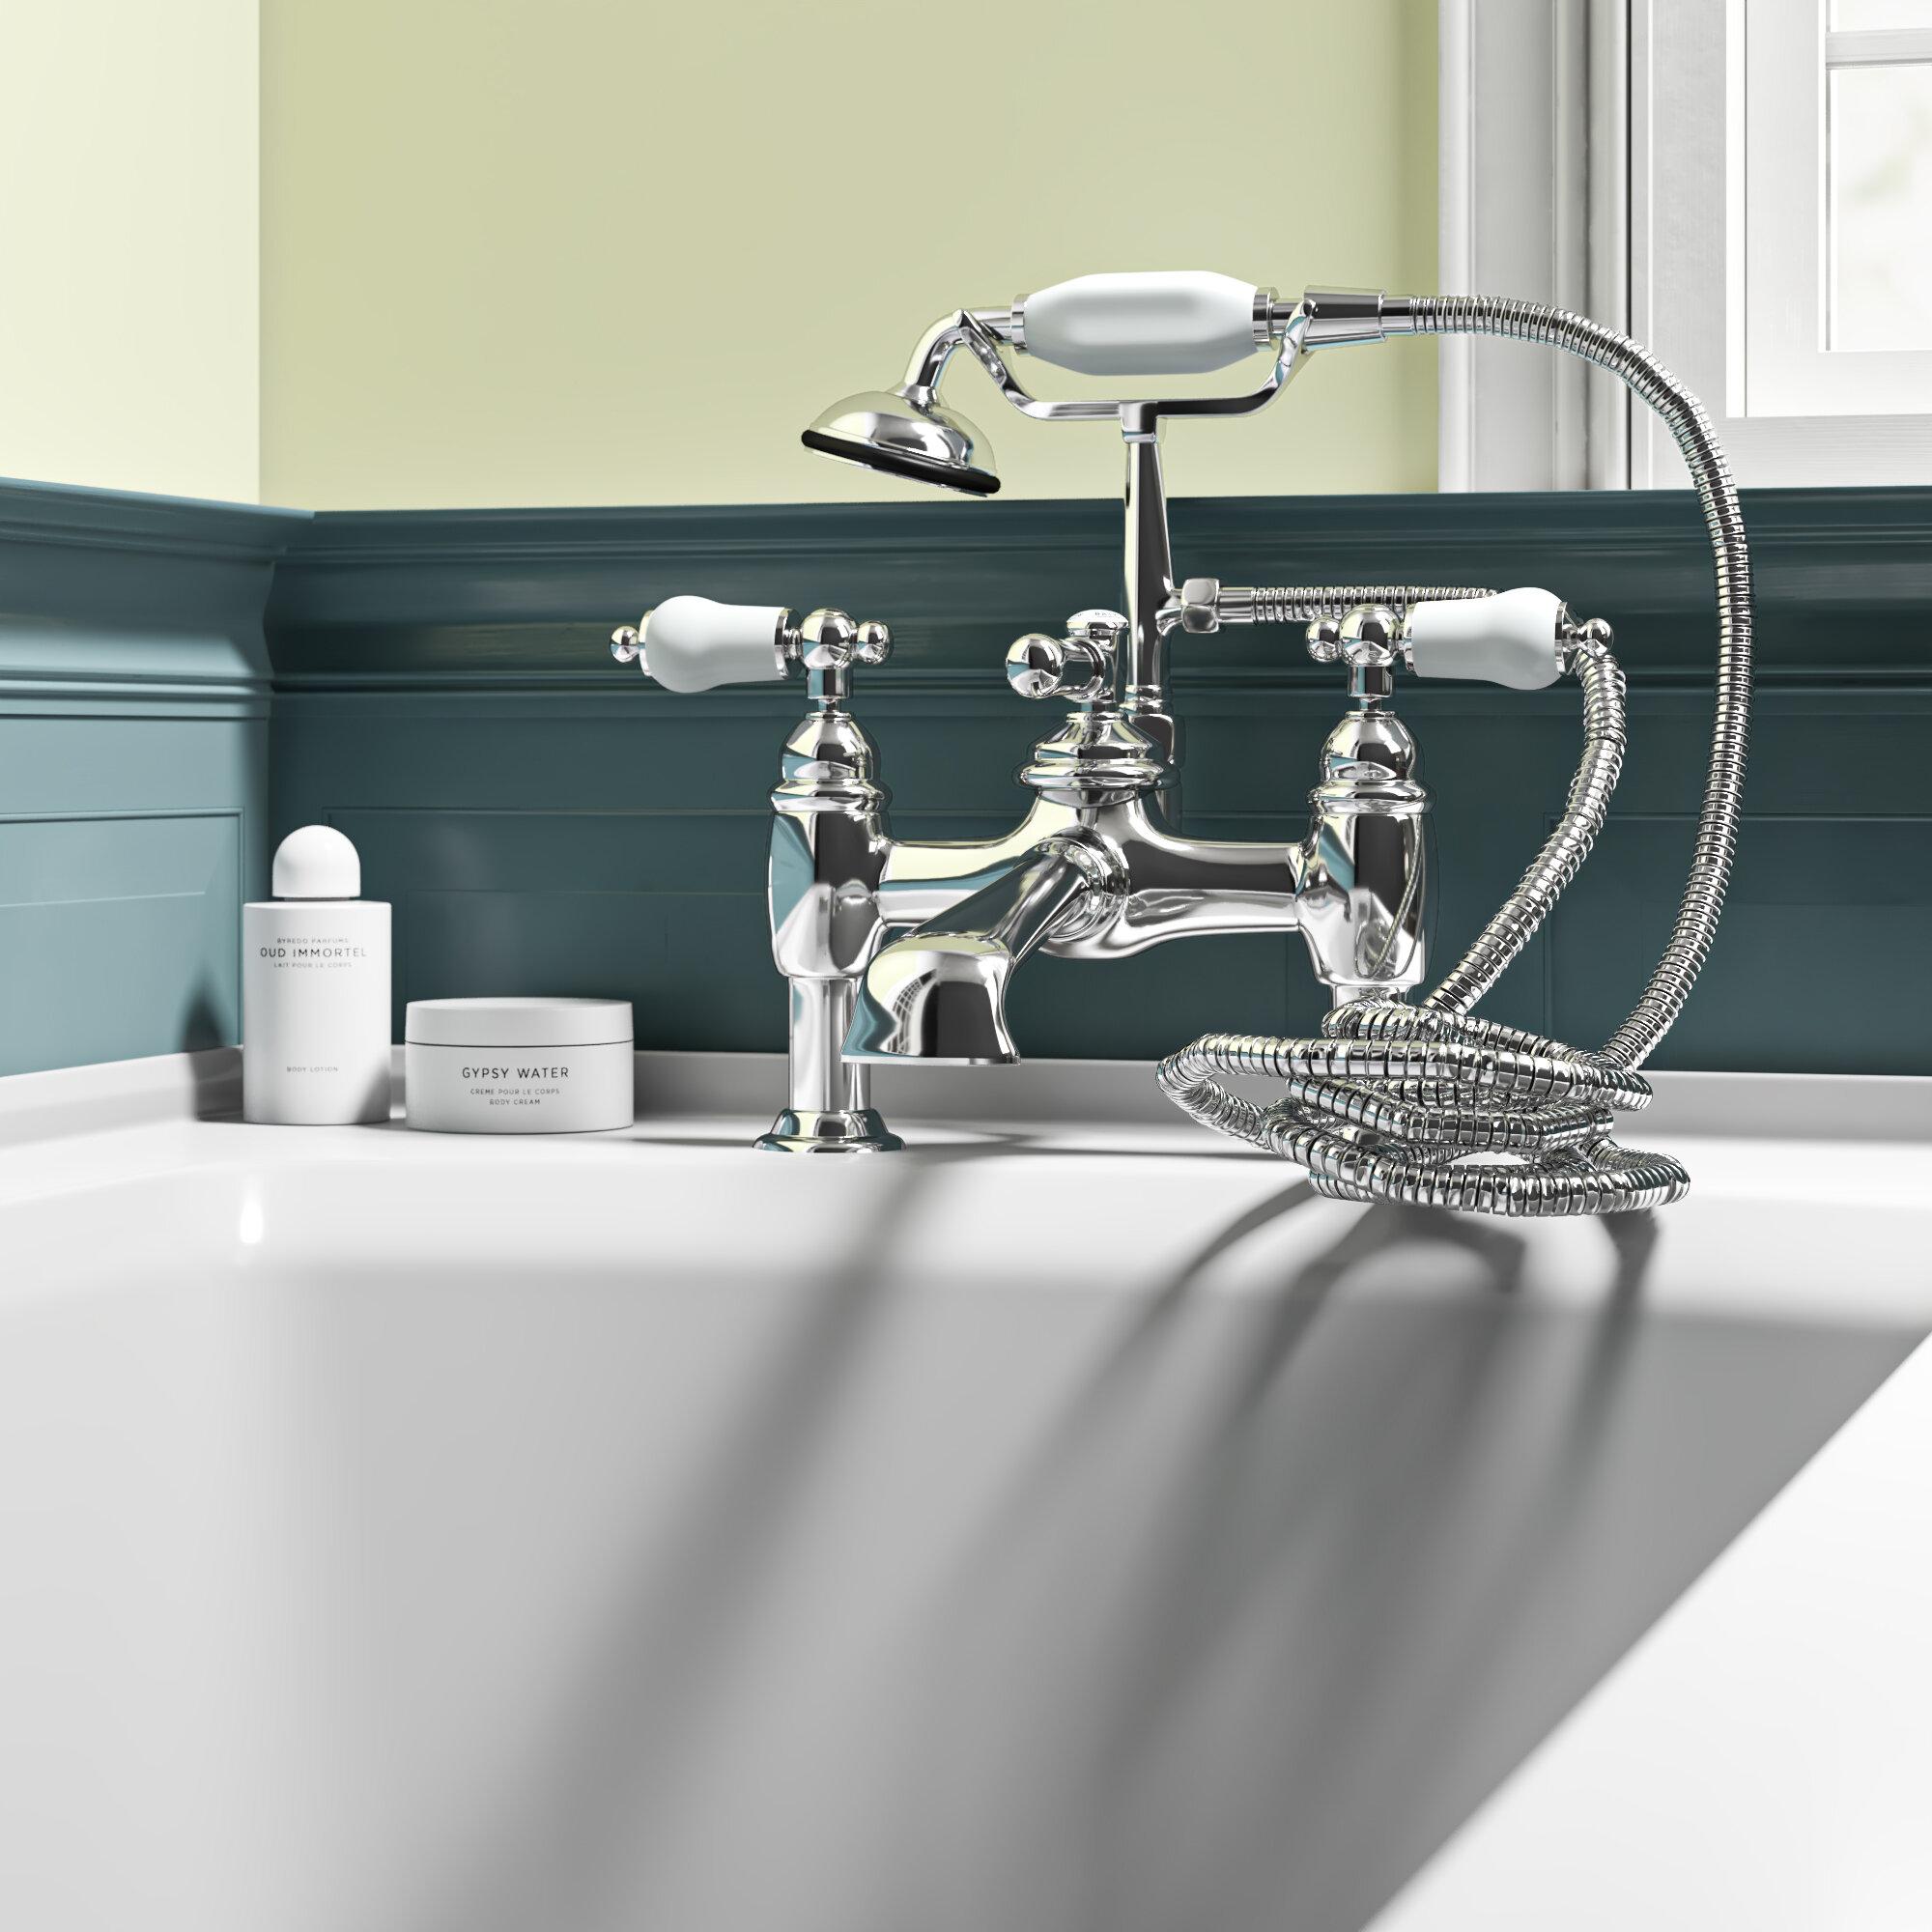 Vintage Triple Handle Deck Mounted Clawfoot Tub Faucet Trim With Handshower Birch Lane